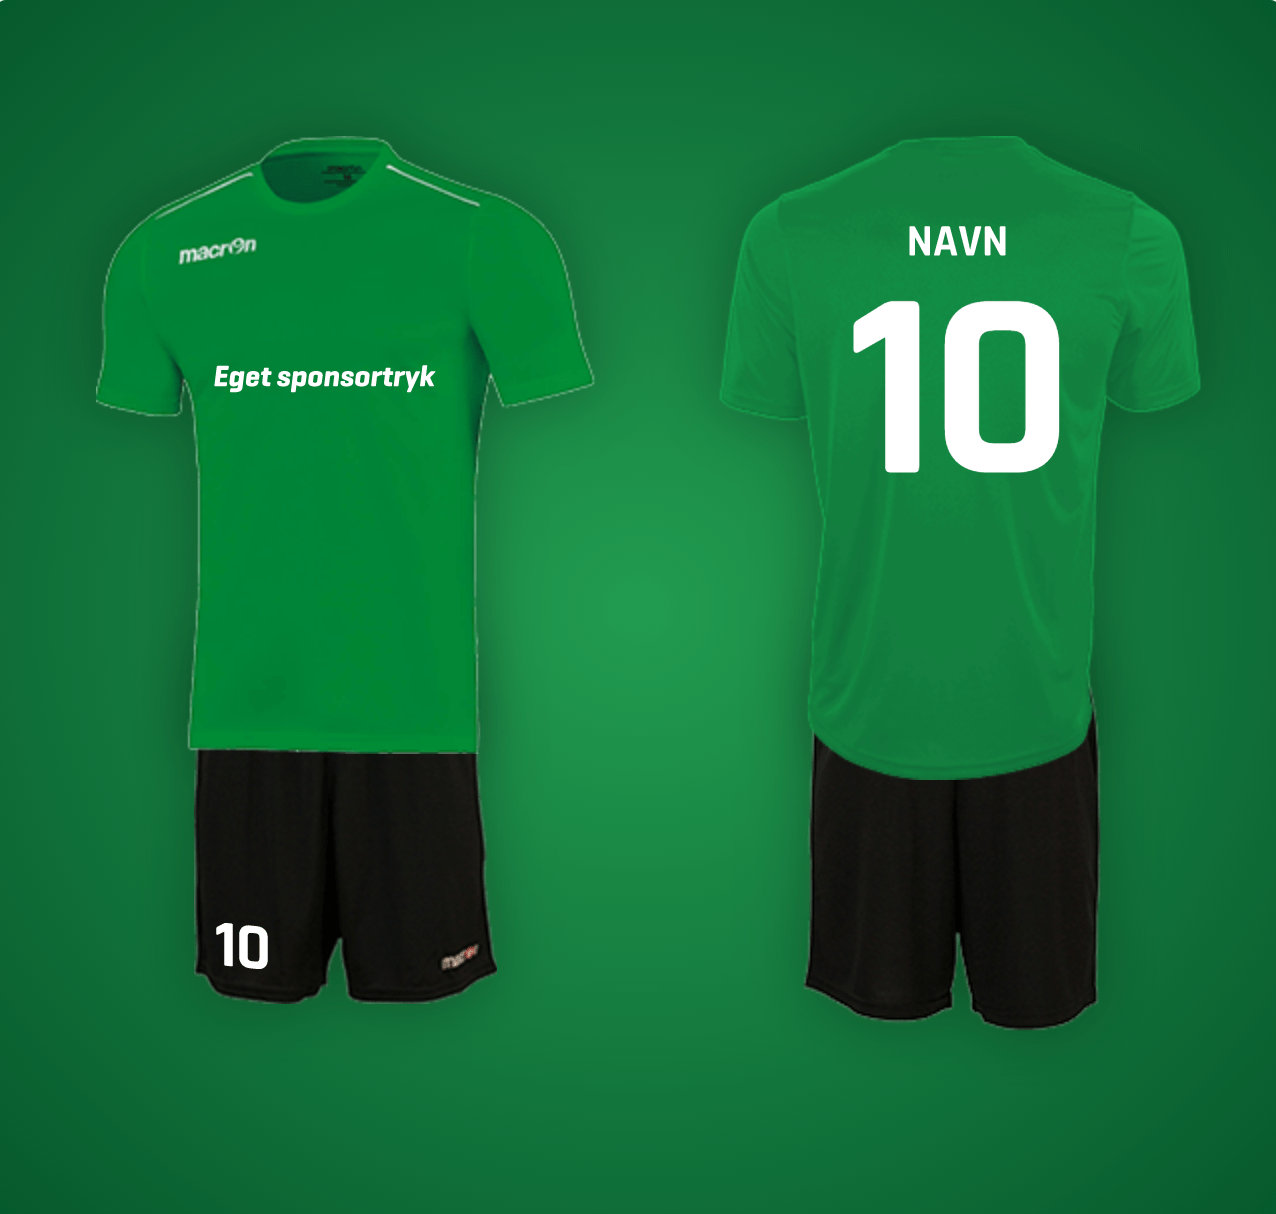 macron rigel grønt fodboldsæt